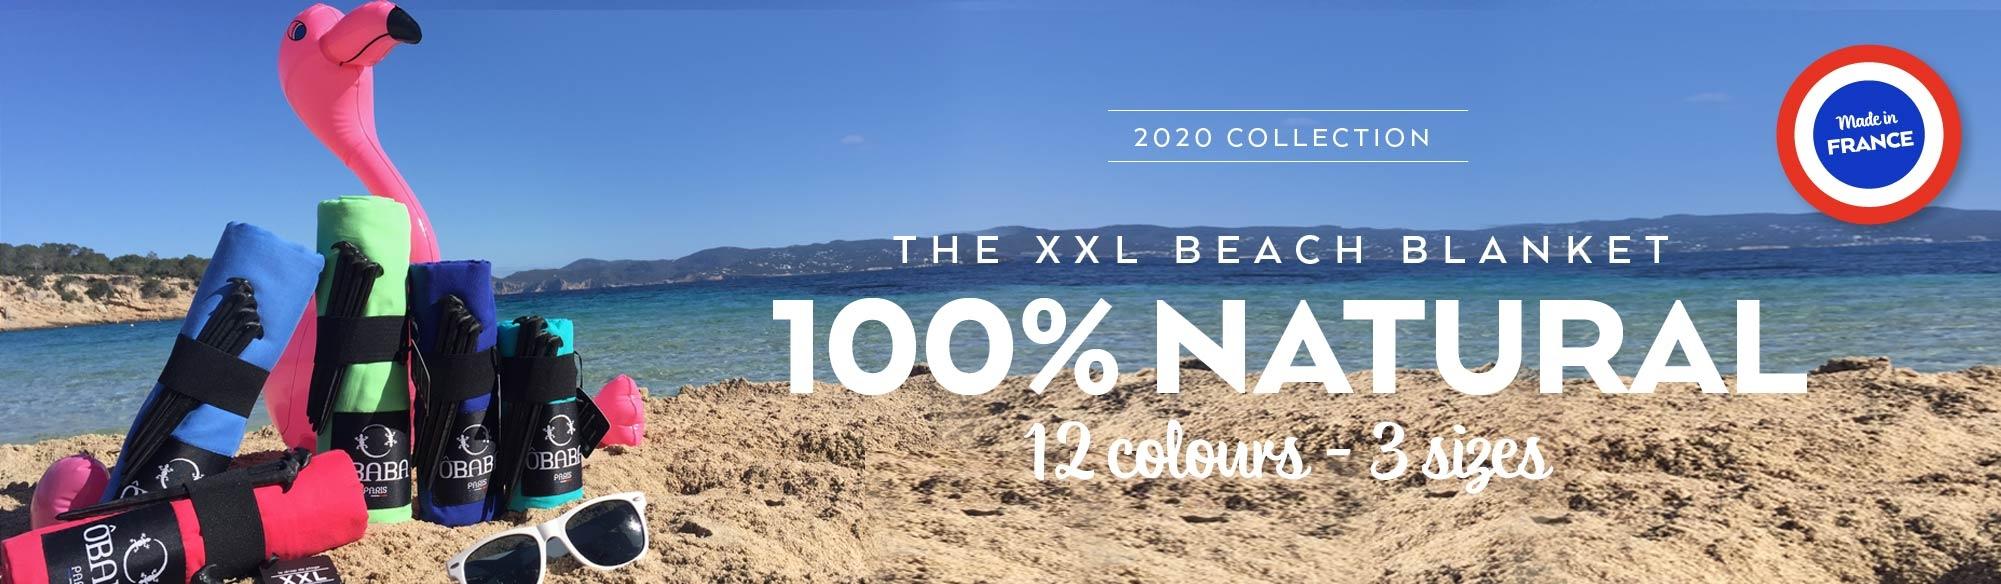 The natural beach blanket